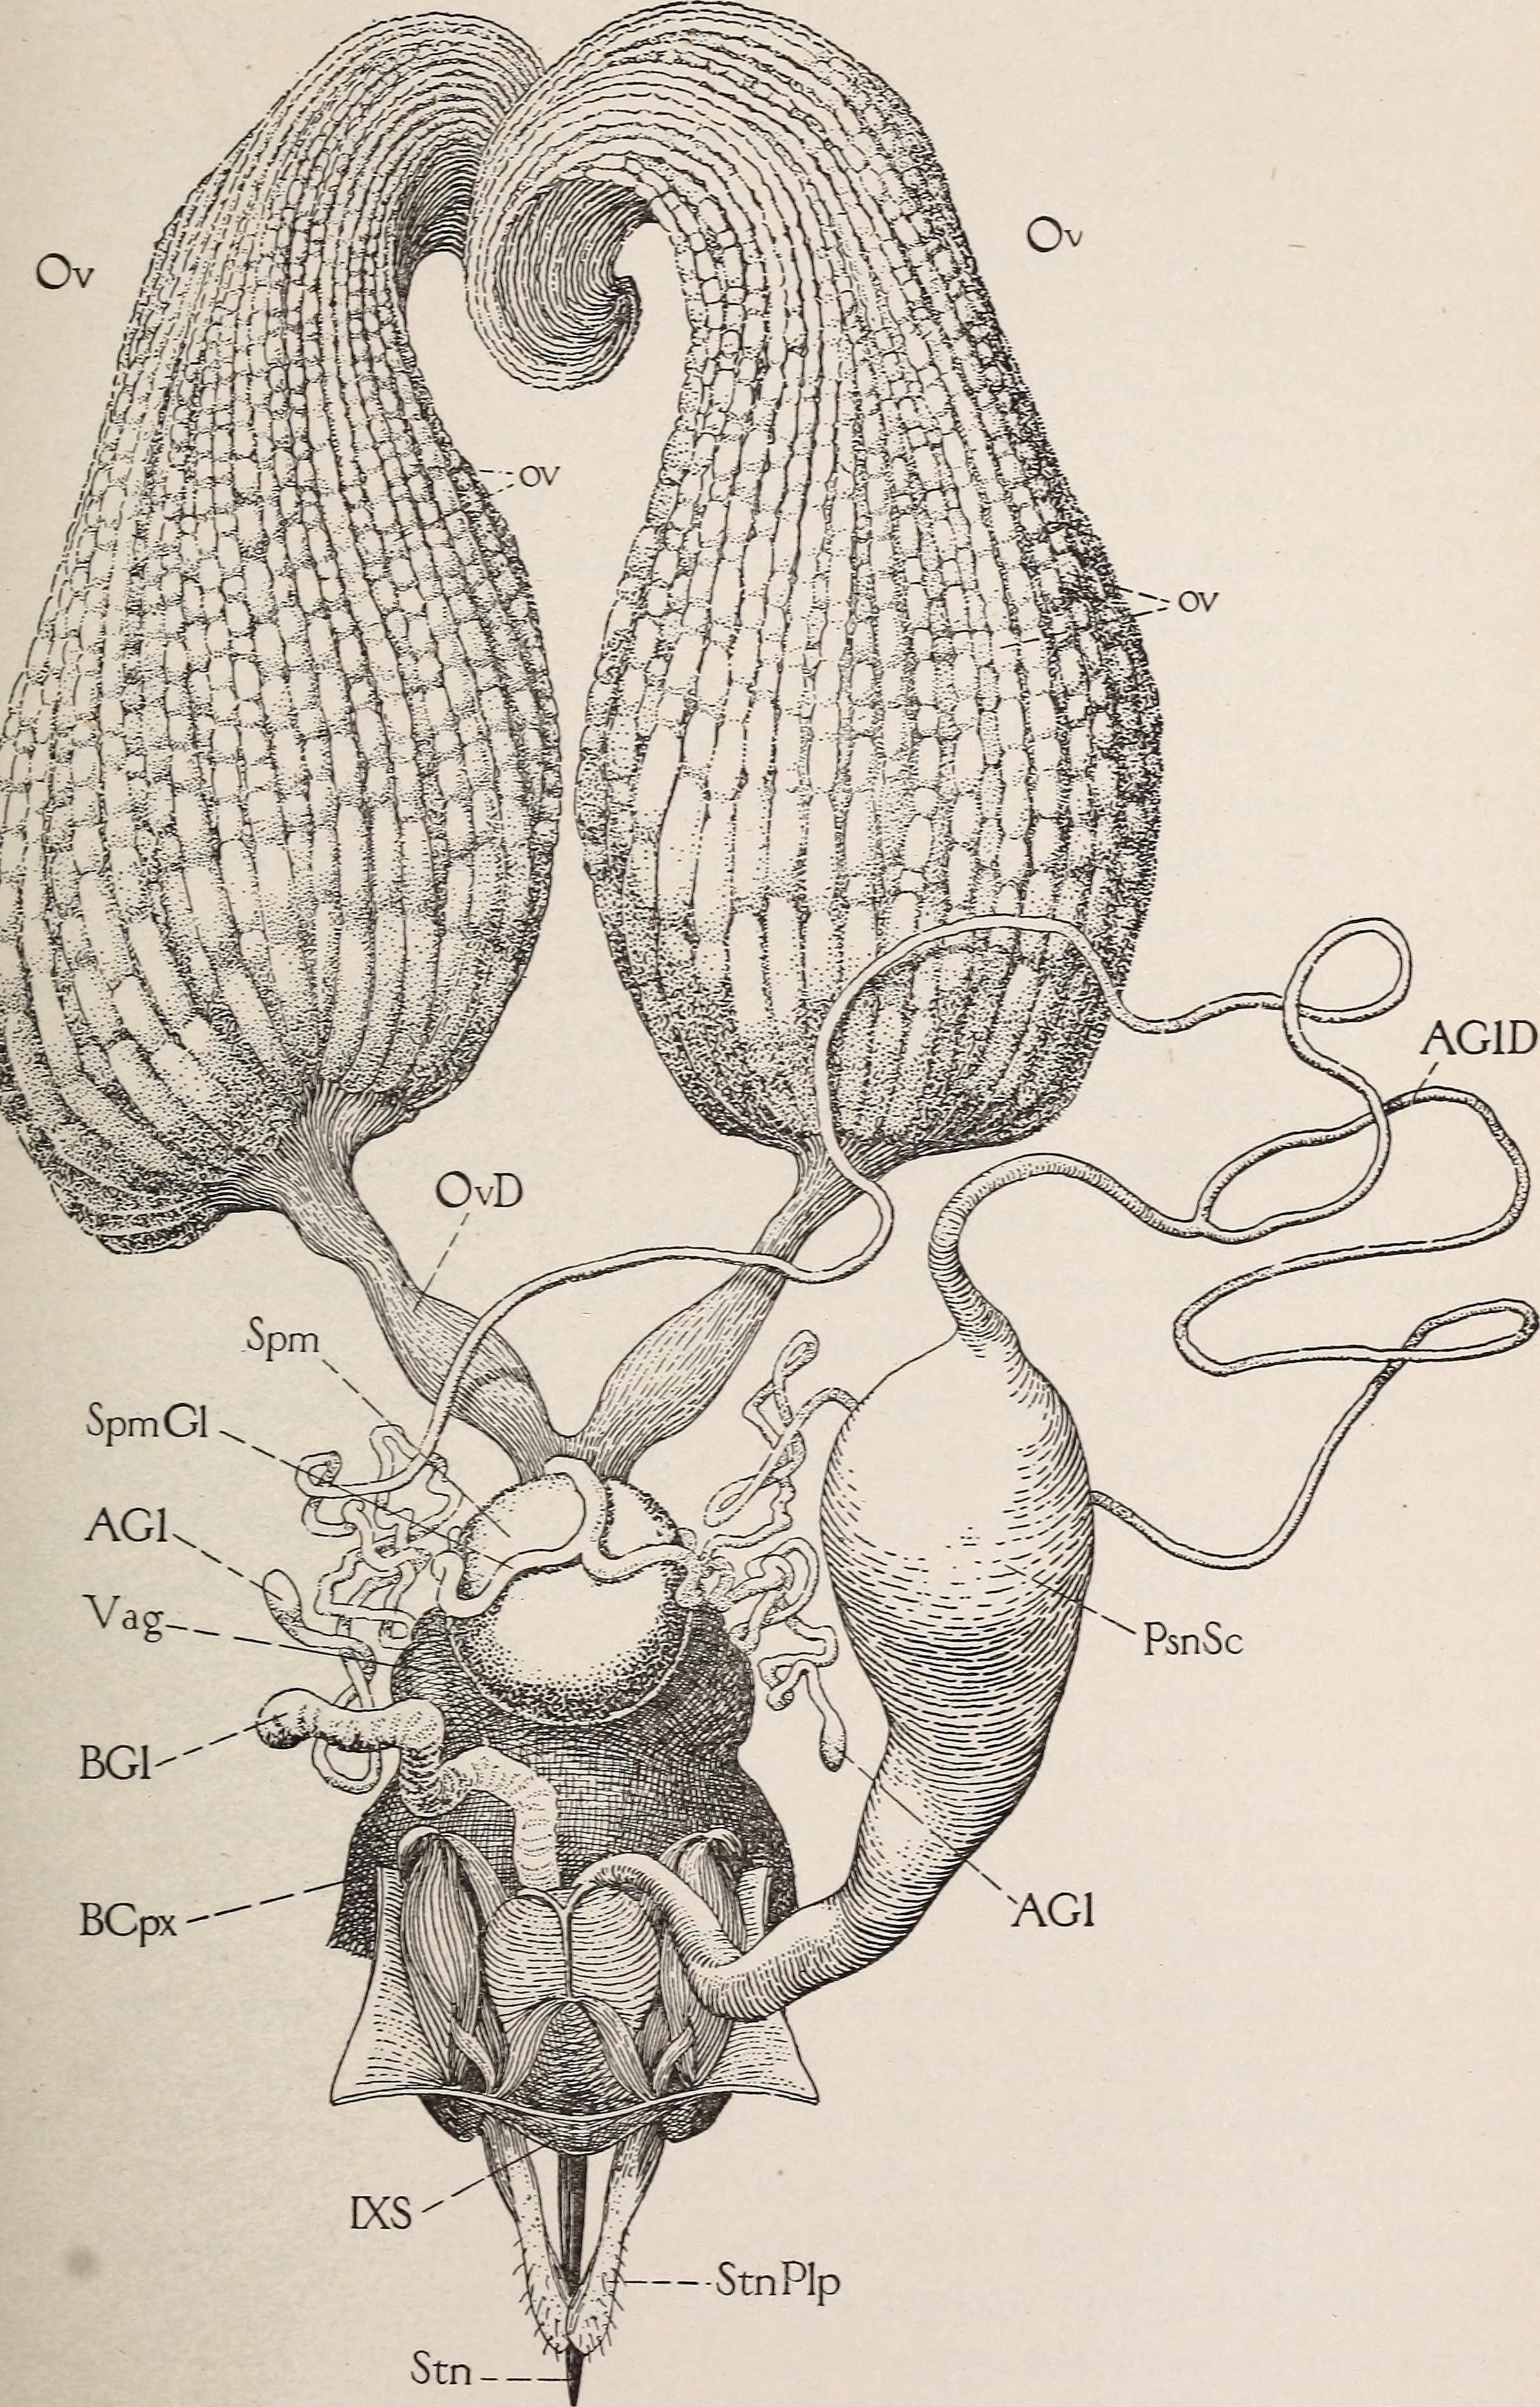 Dateithe Anatomy Of The Honey Bee 1910 18190998122g Wiktionary